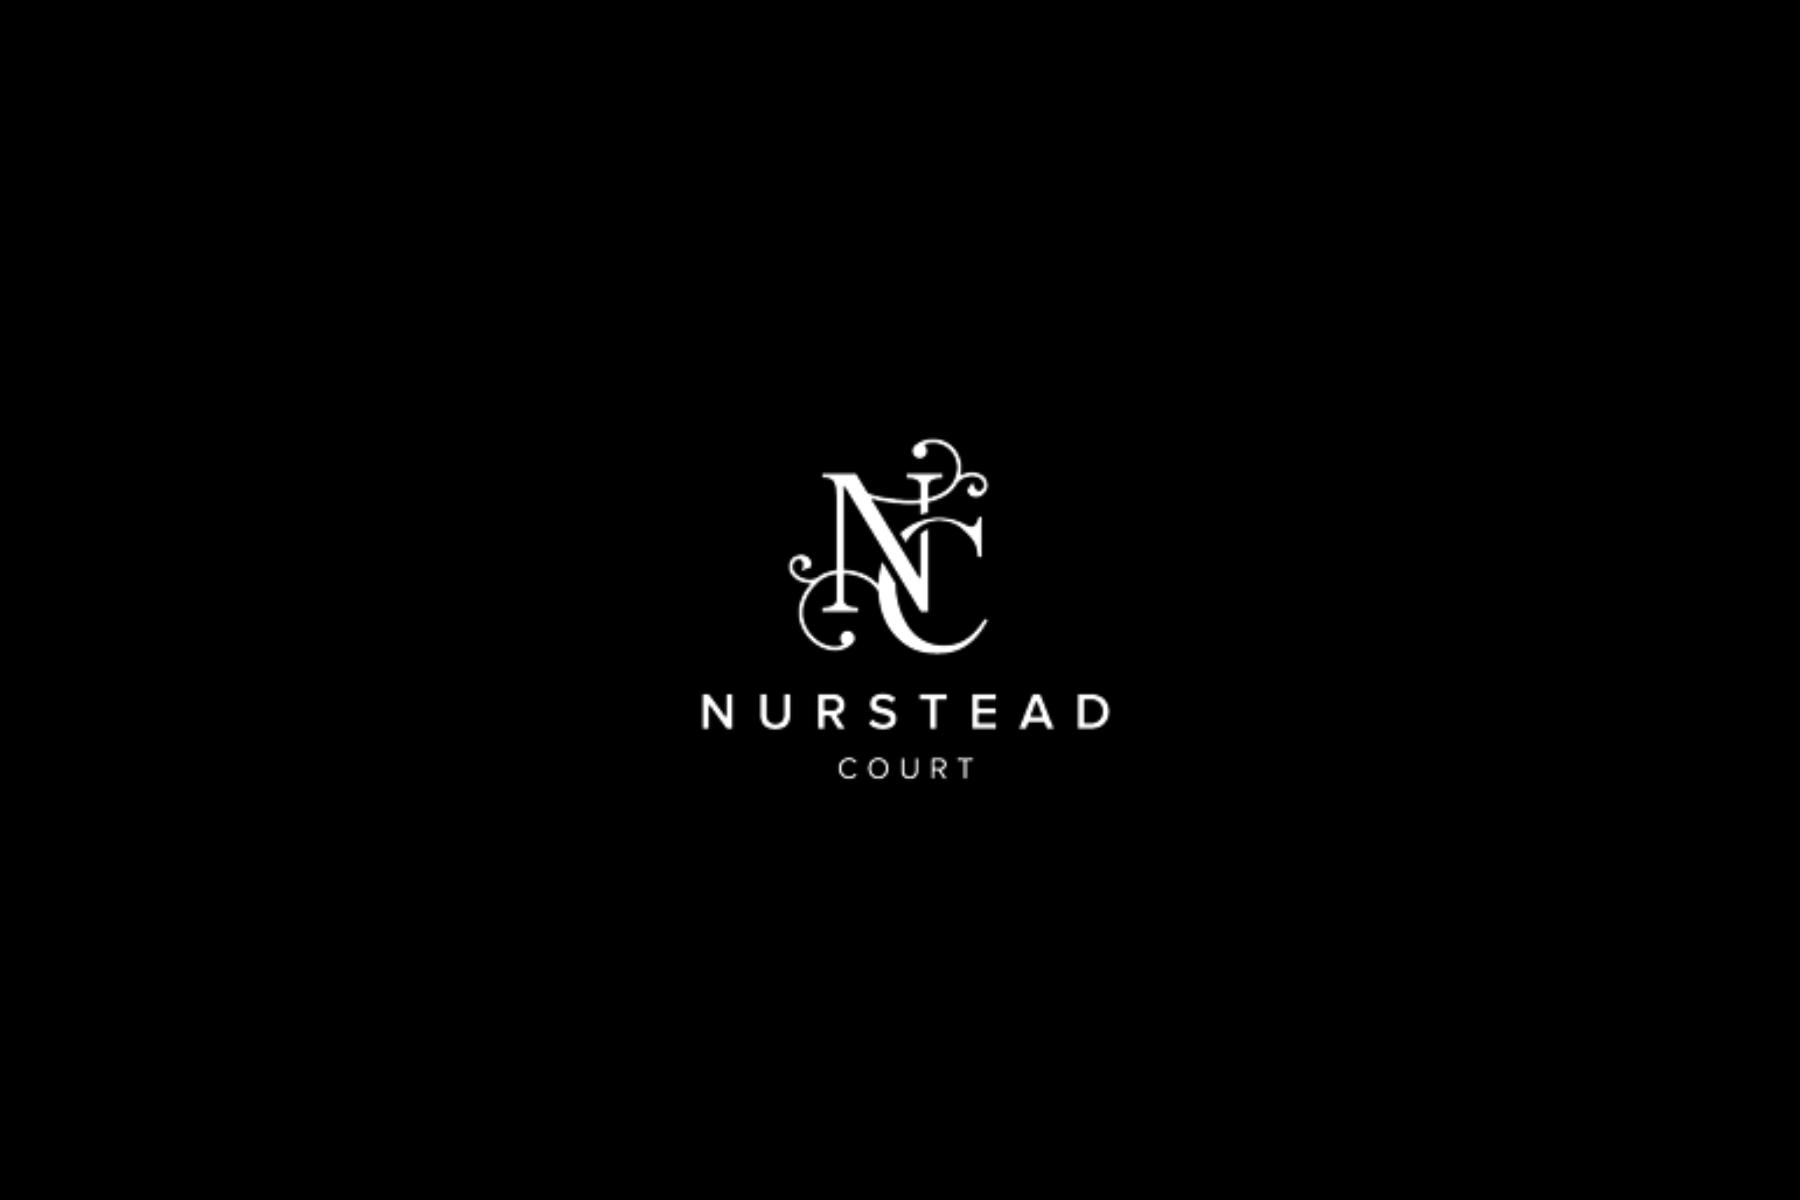 Luke Batchelor Productions Recommended Supplier NURSTEAD COURT